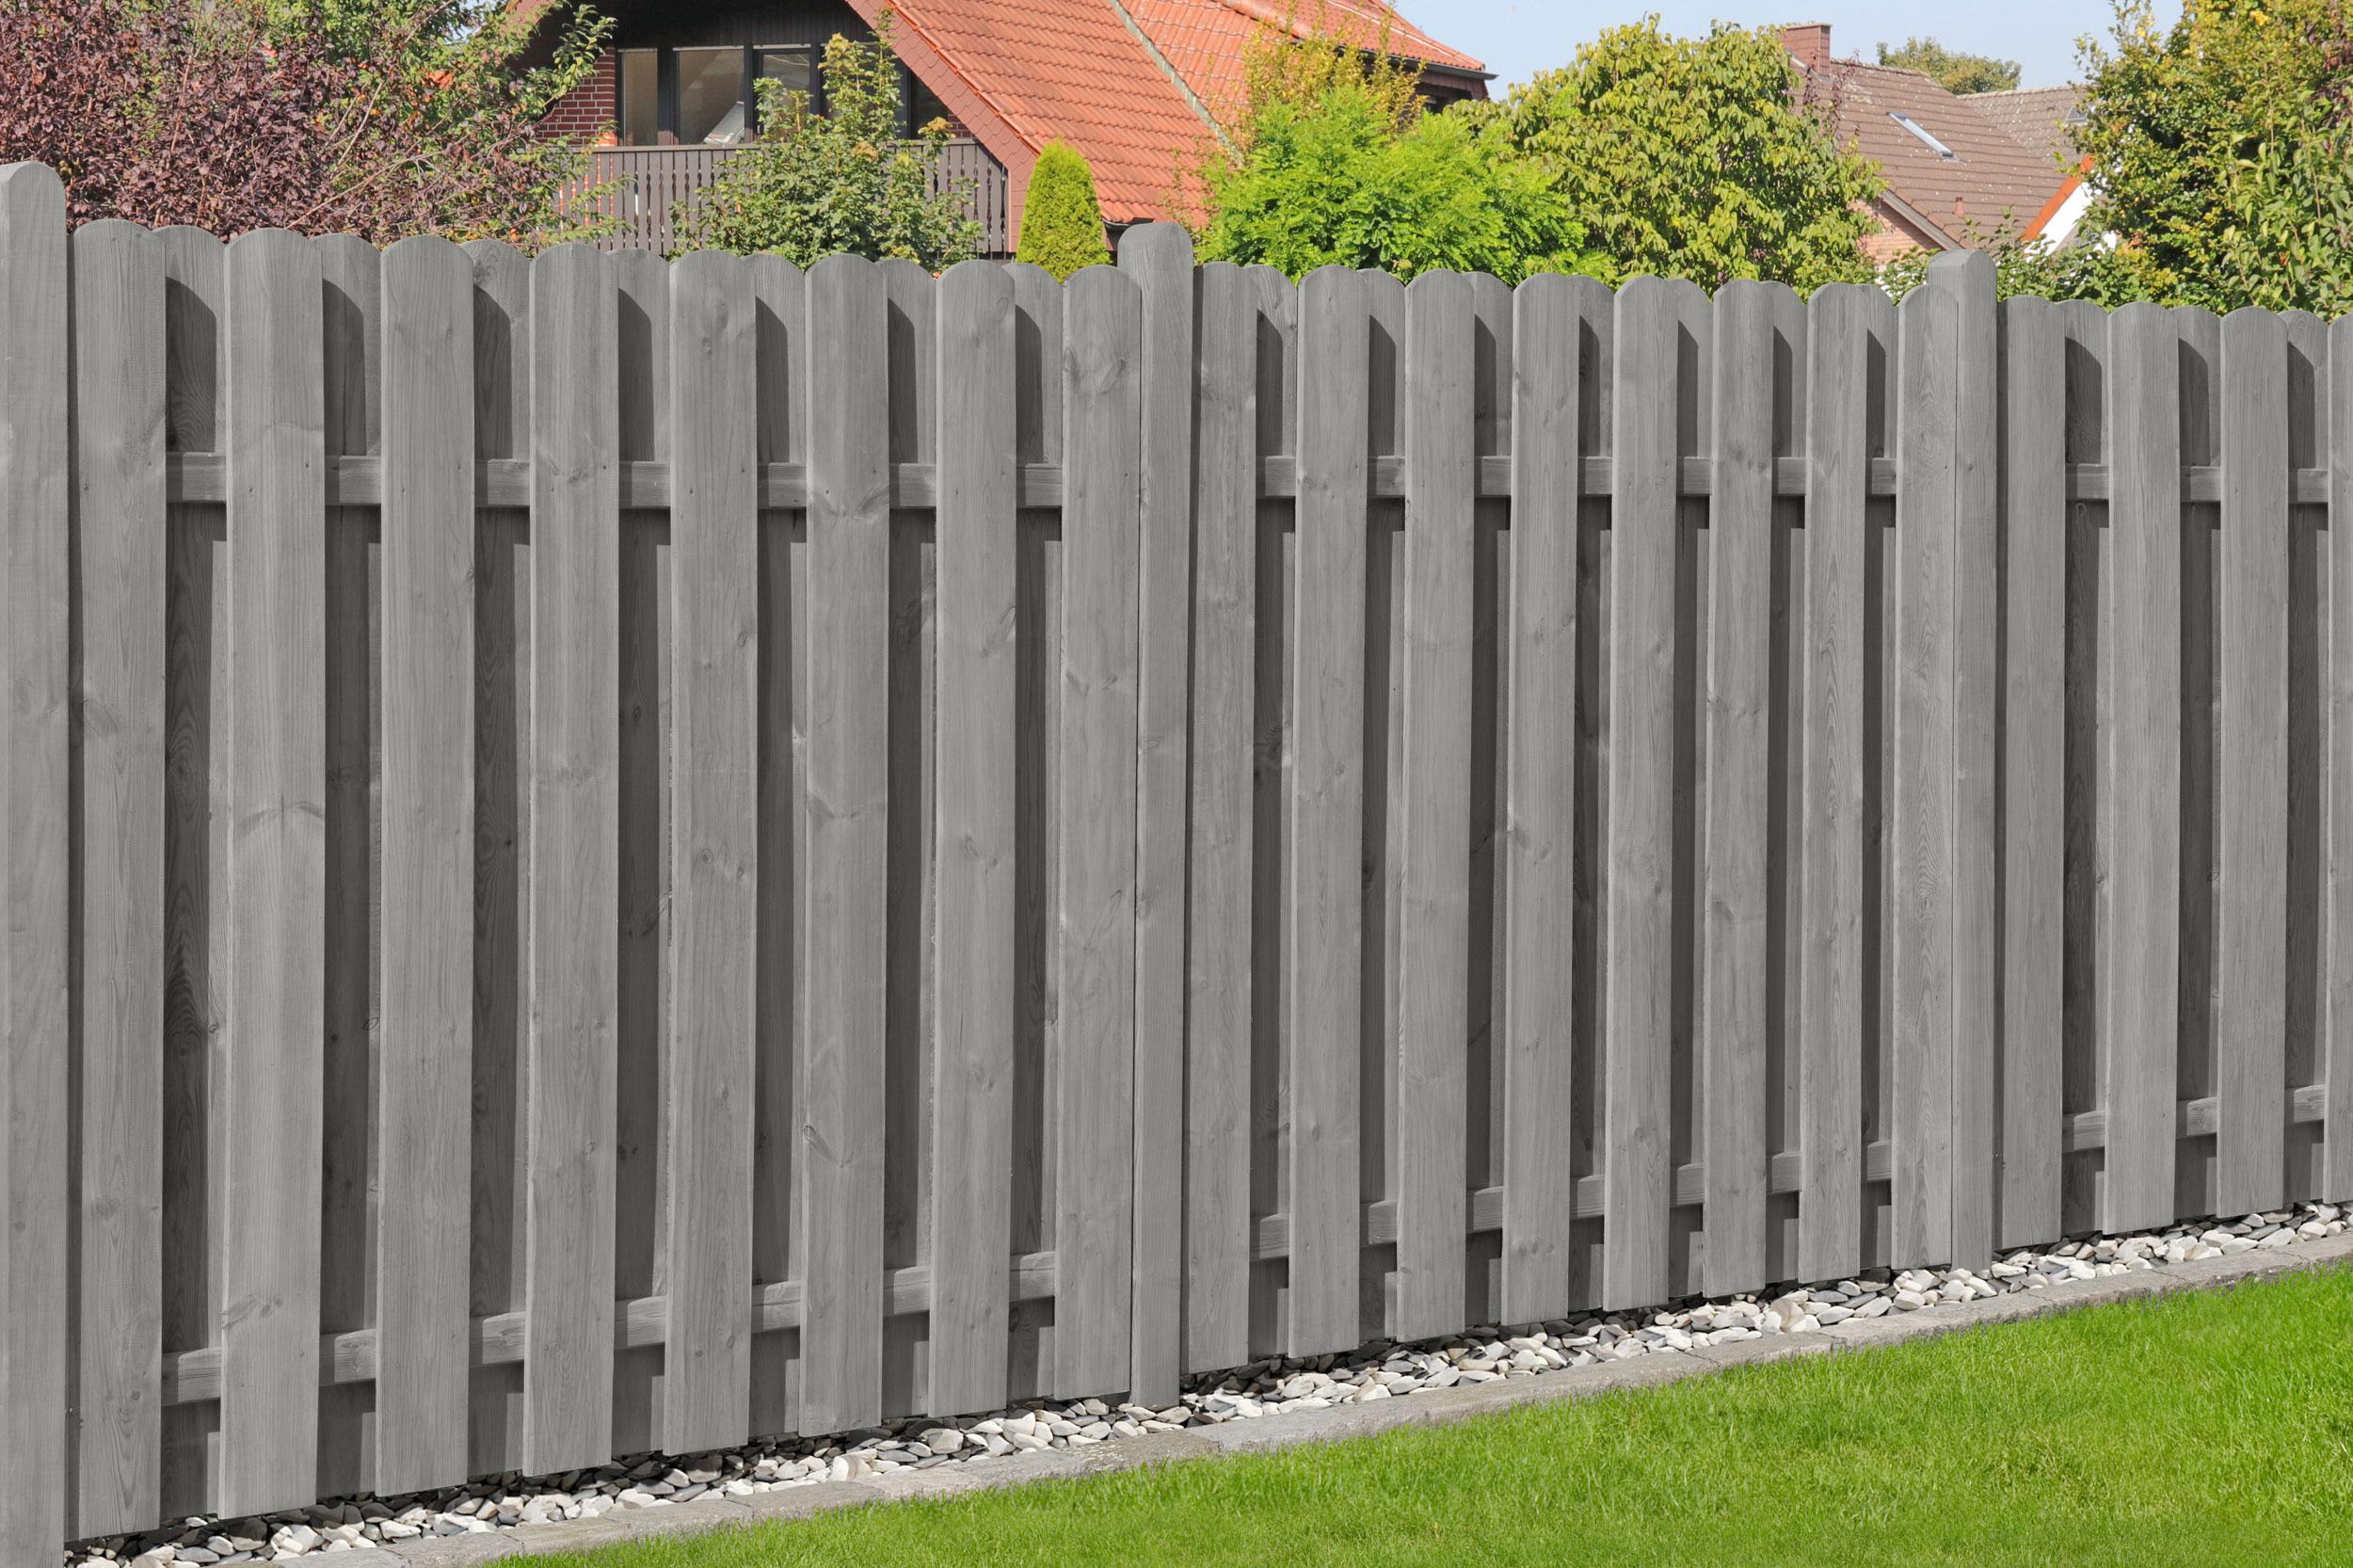 Sichtschutzzaun Bohlenzaun Element Holz Ki Grau 180x180cm Bei